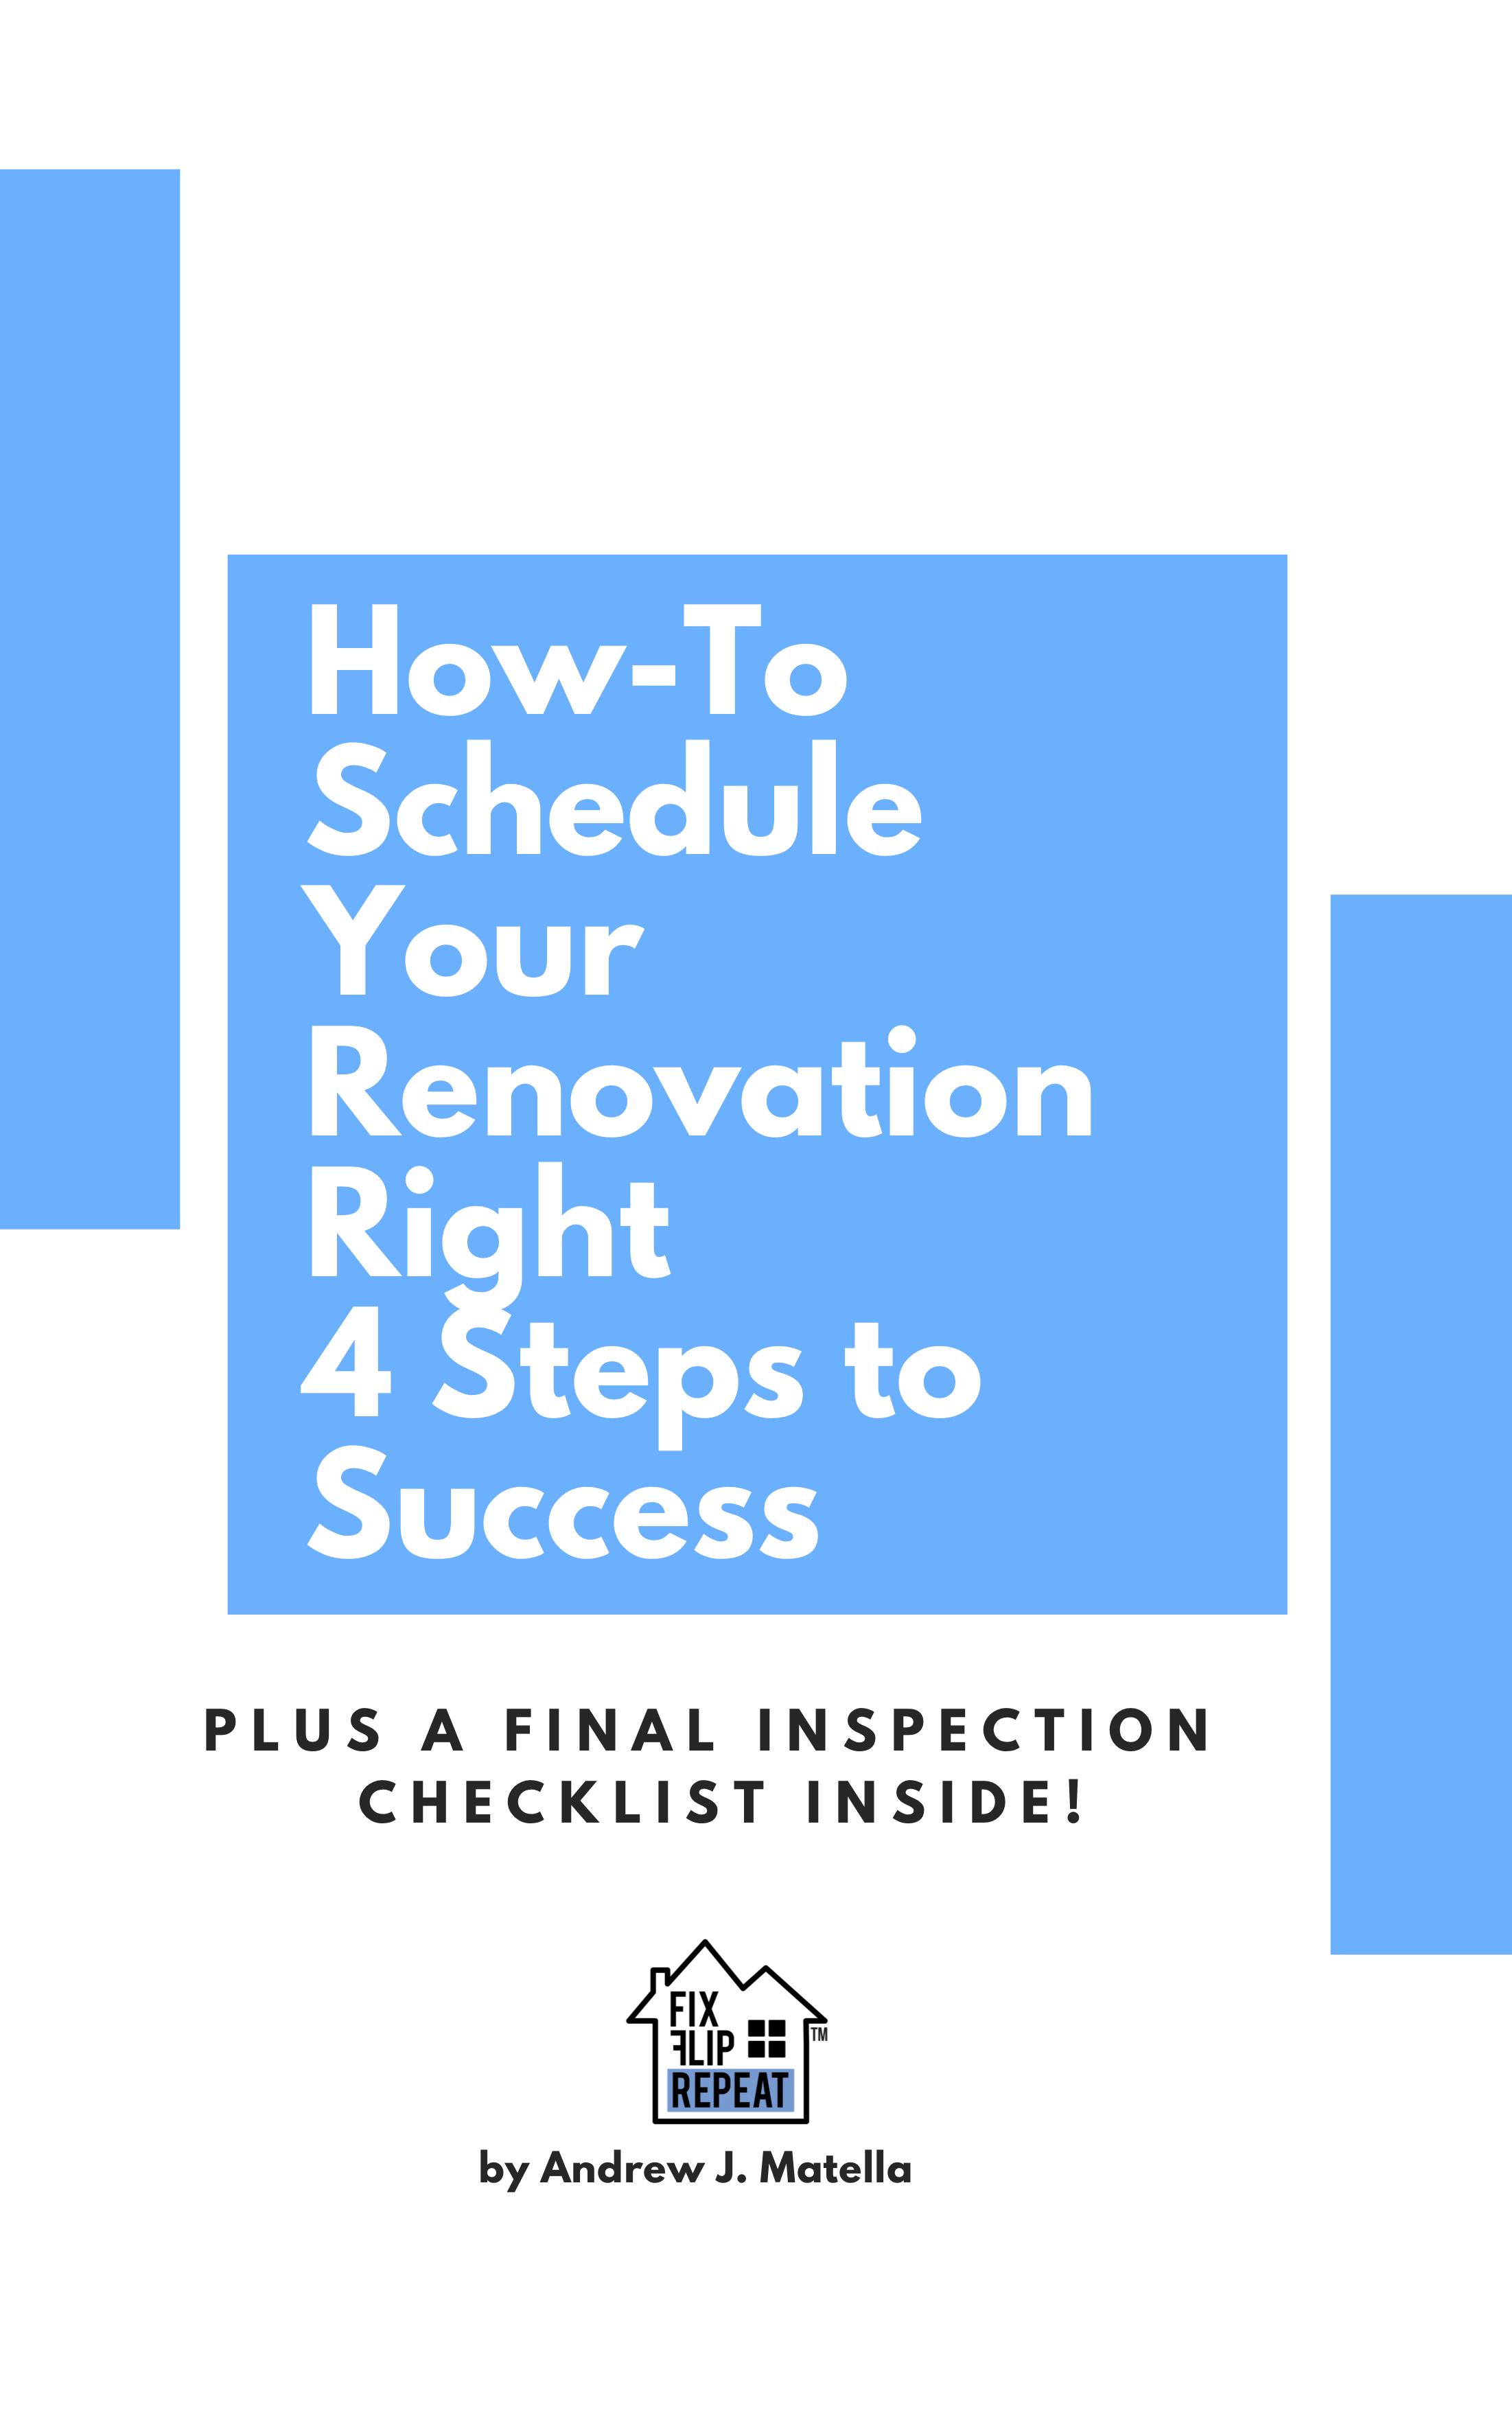 Info Guide #2full blueprint to schedule fix & Flip renovations -